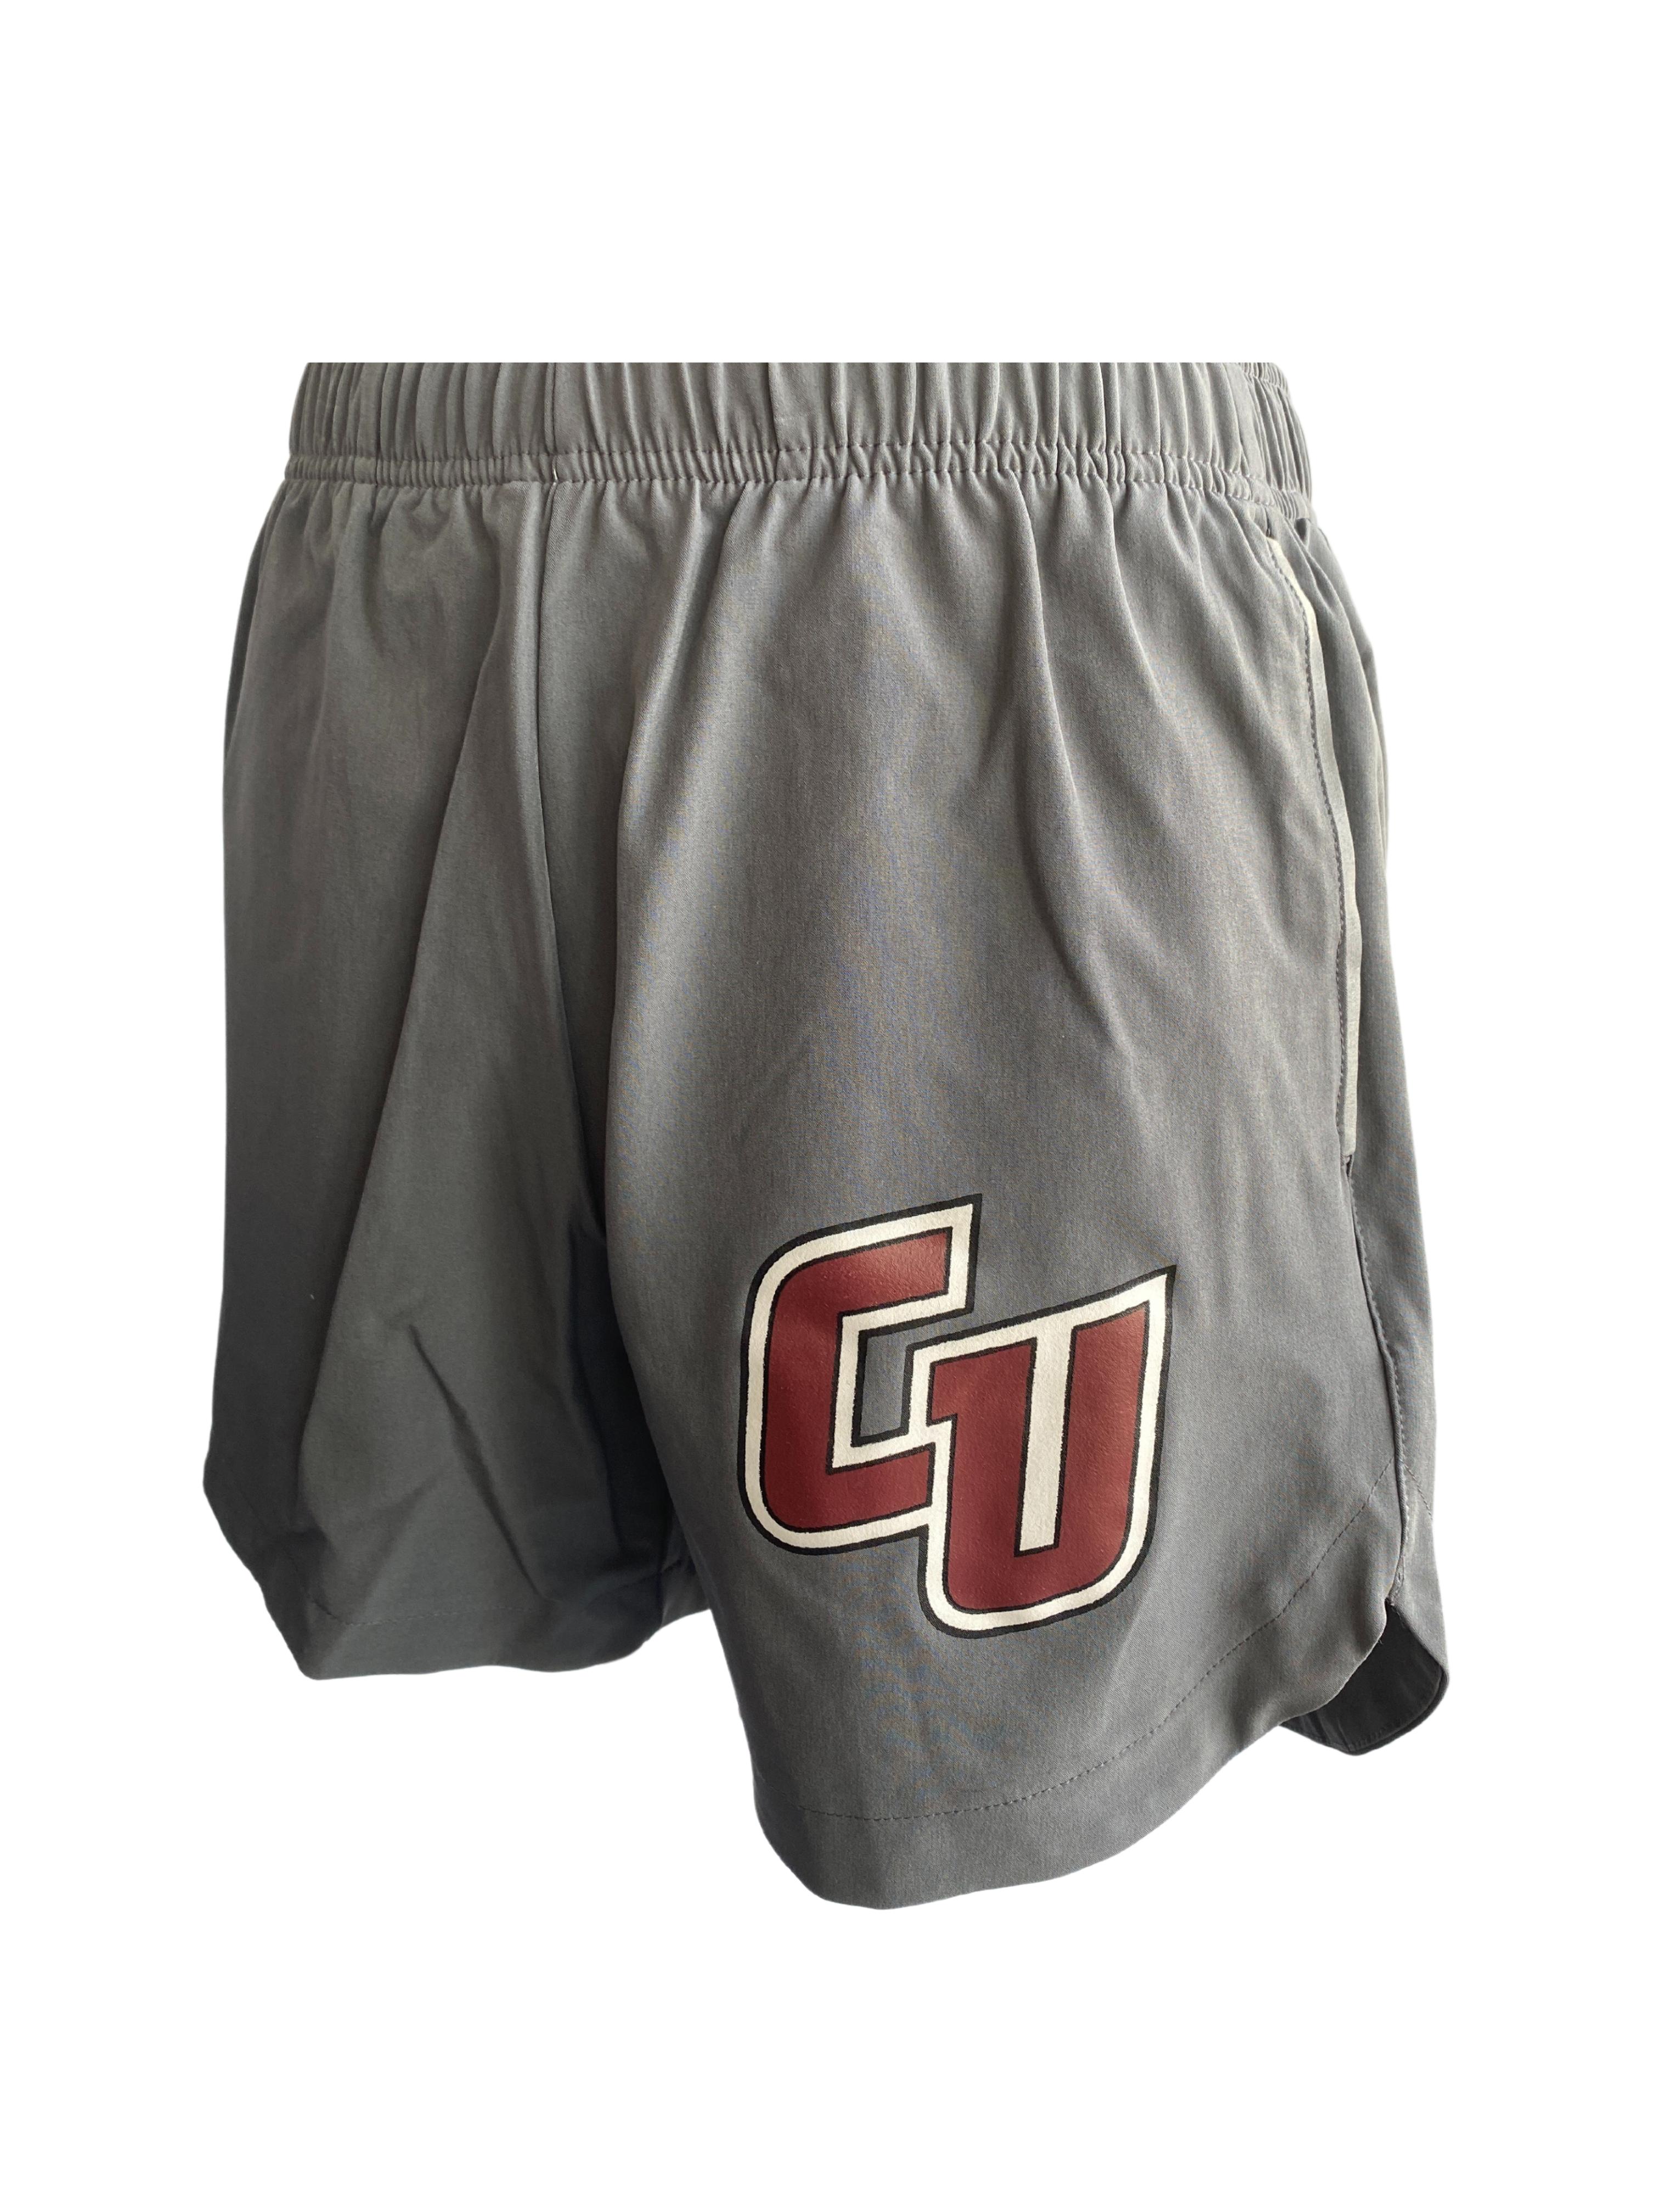 CU Women's Shorts